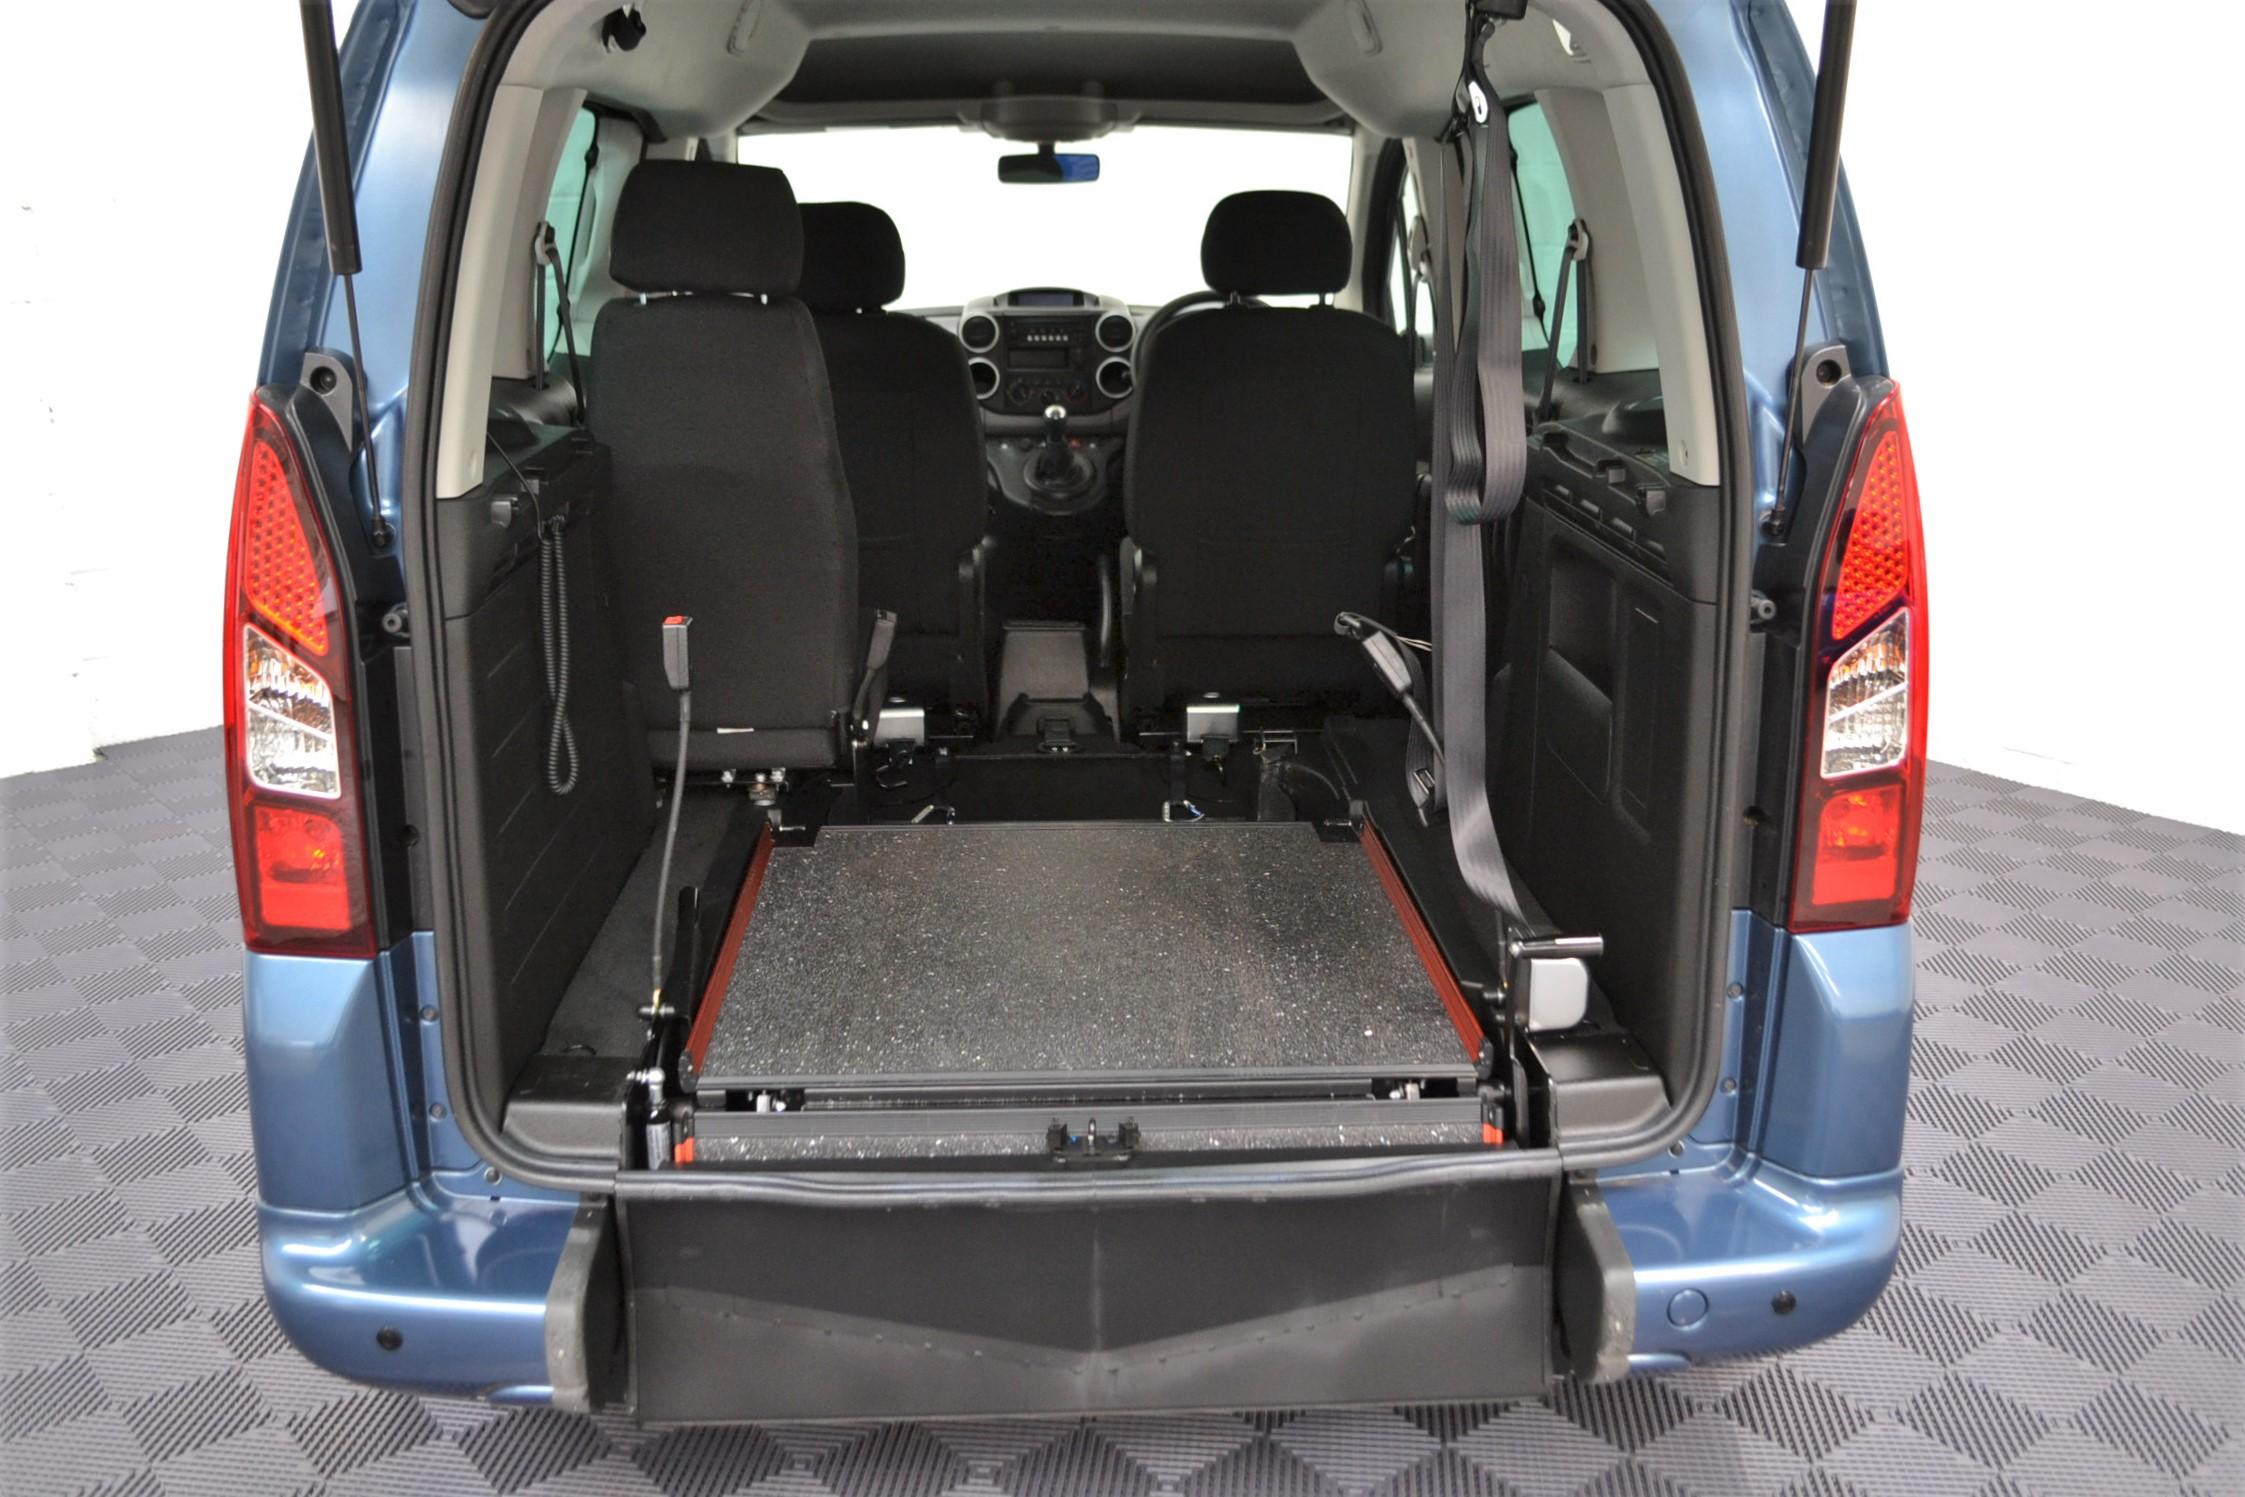 WAV Cars For Sale Bristol Wheelchair Accessible Vehicles Used For Sale Somerset Devon Dorset Bath Peugeot Partner SF67 EEA 6